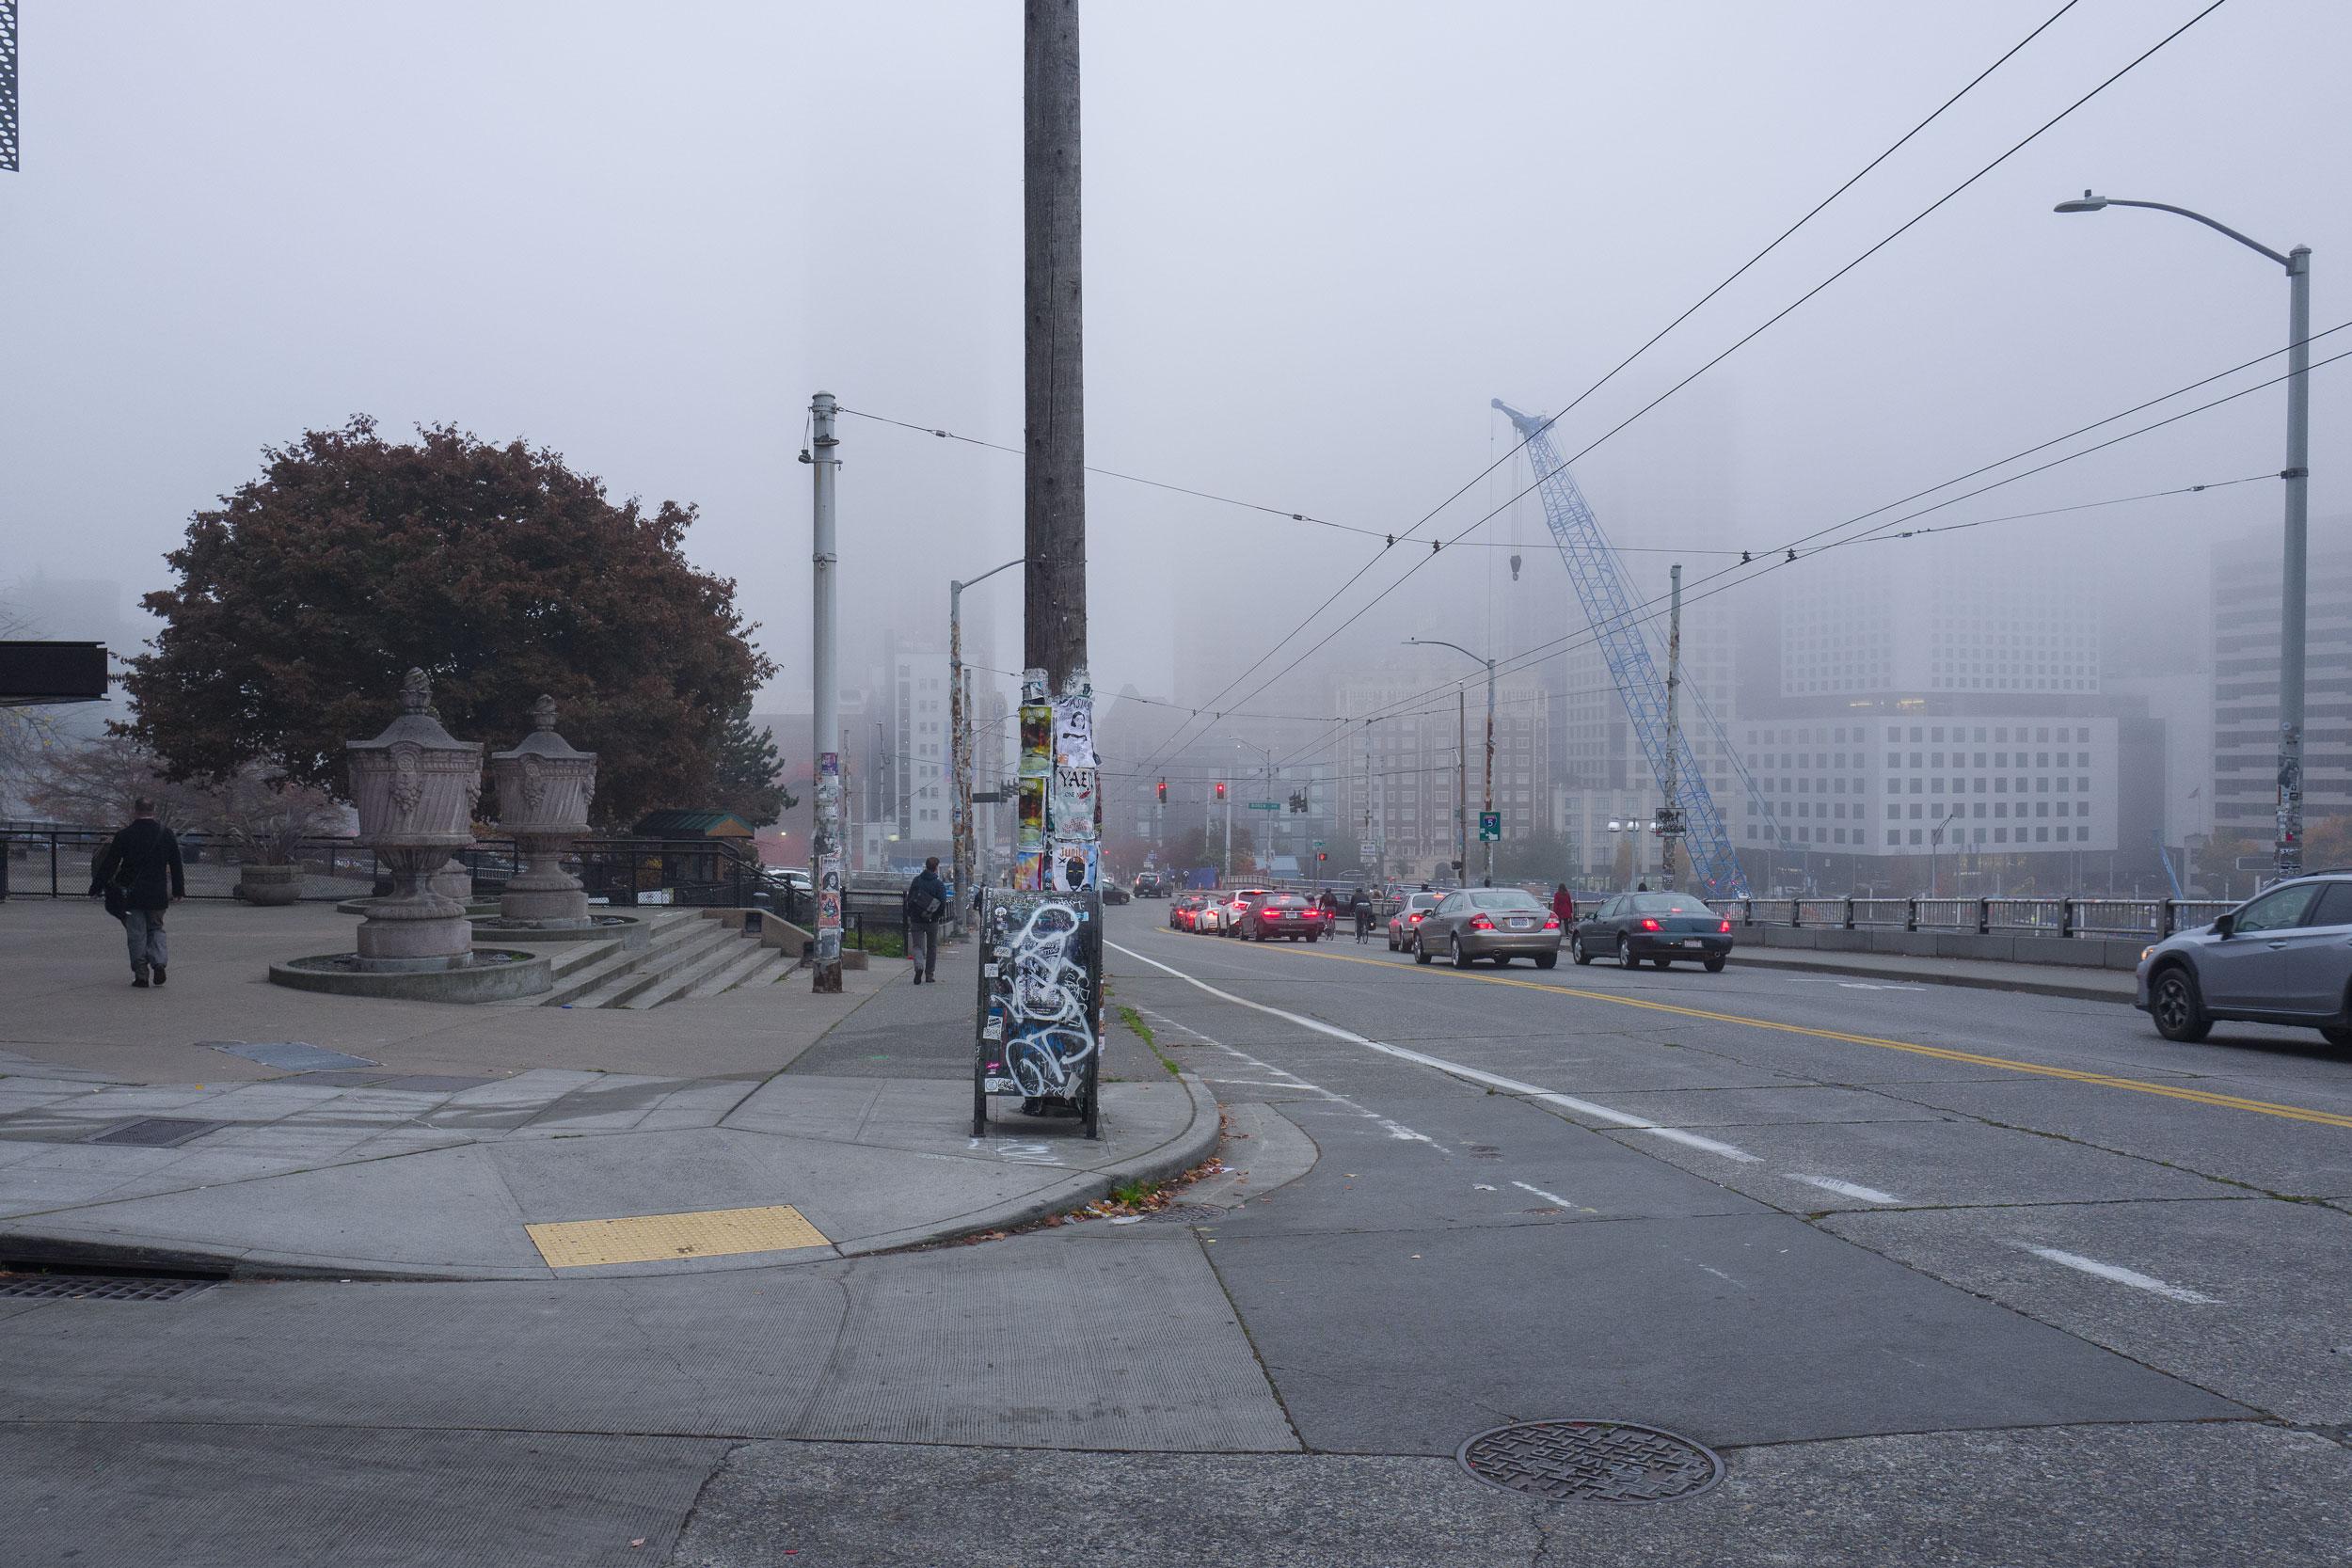 Pine Street, early morning